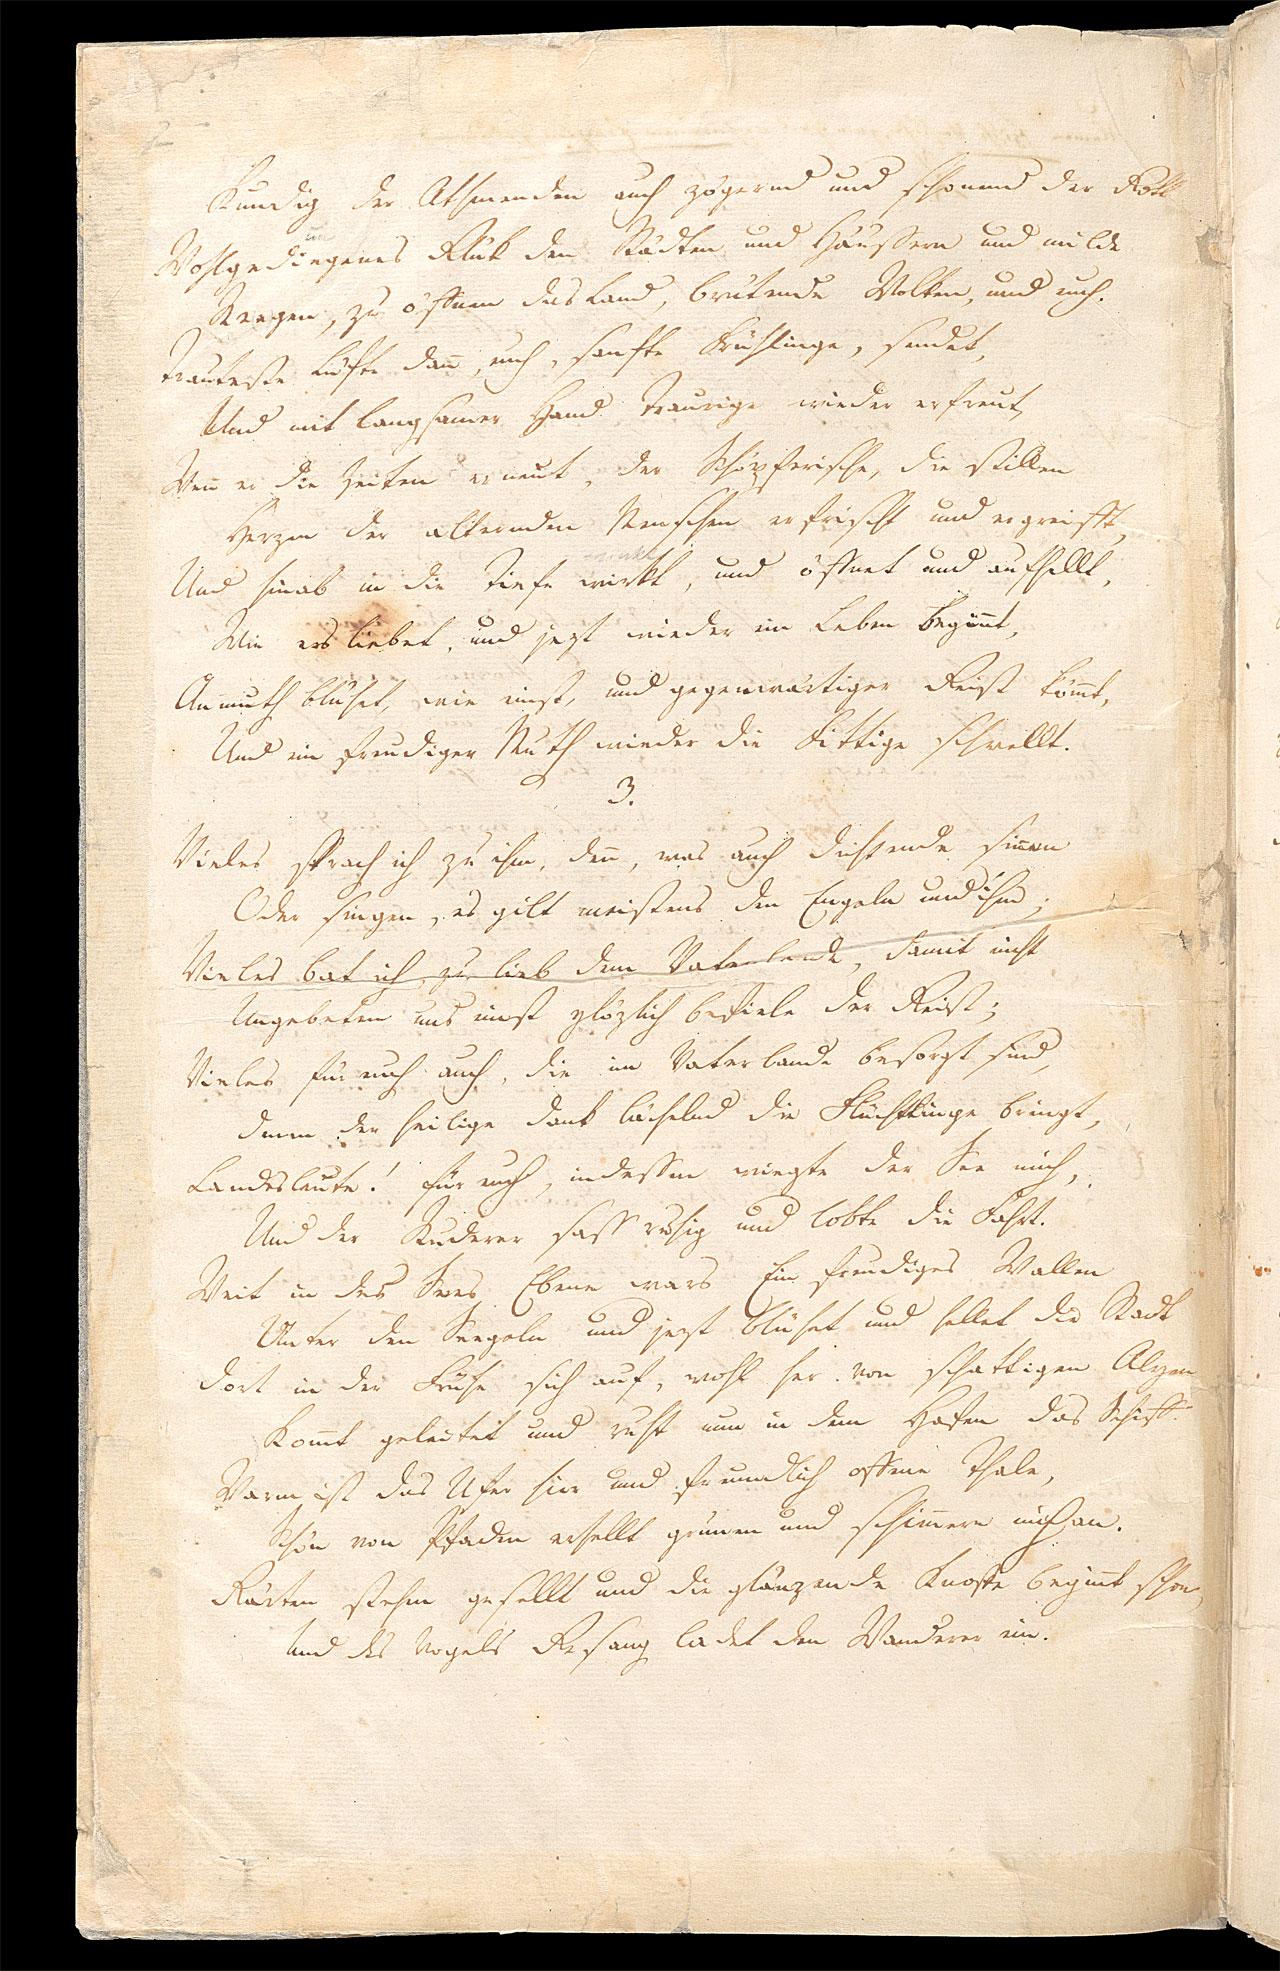 Friedrich Hölderlin, Homburger Folioheft, Seite 2, Heimkunft, Handschrift